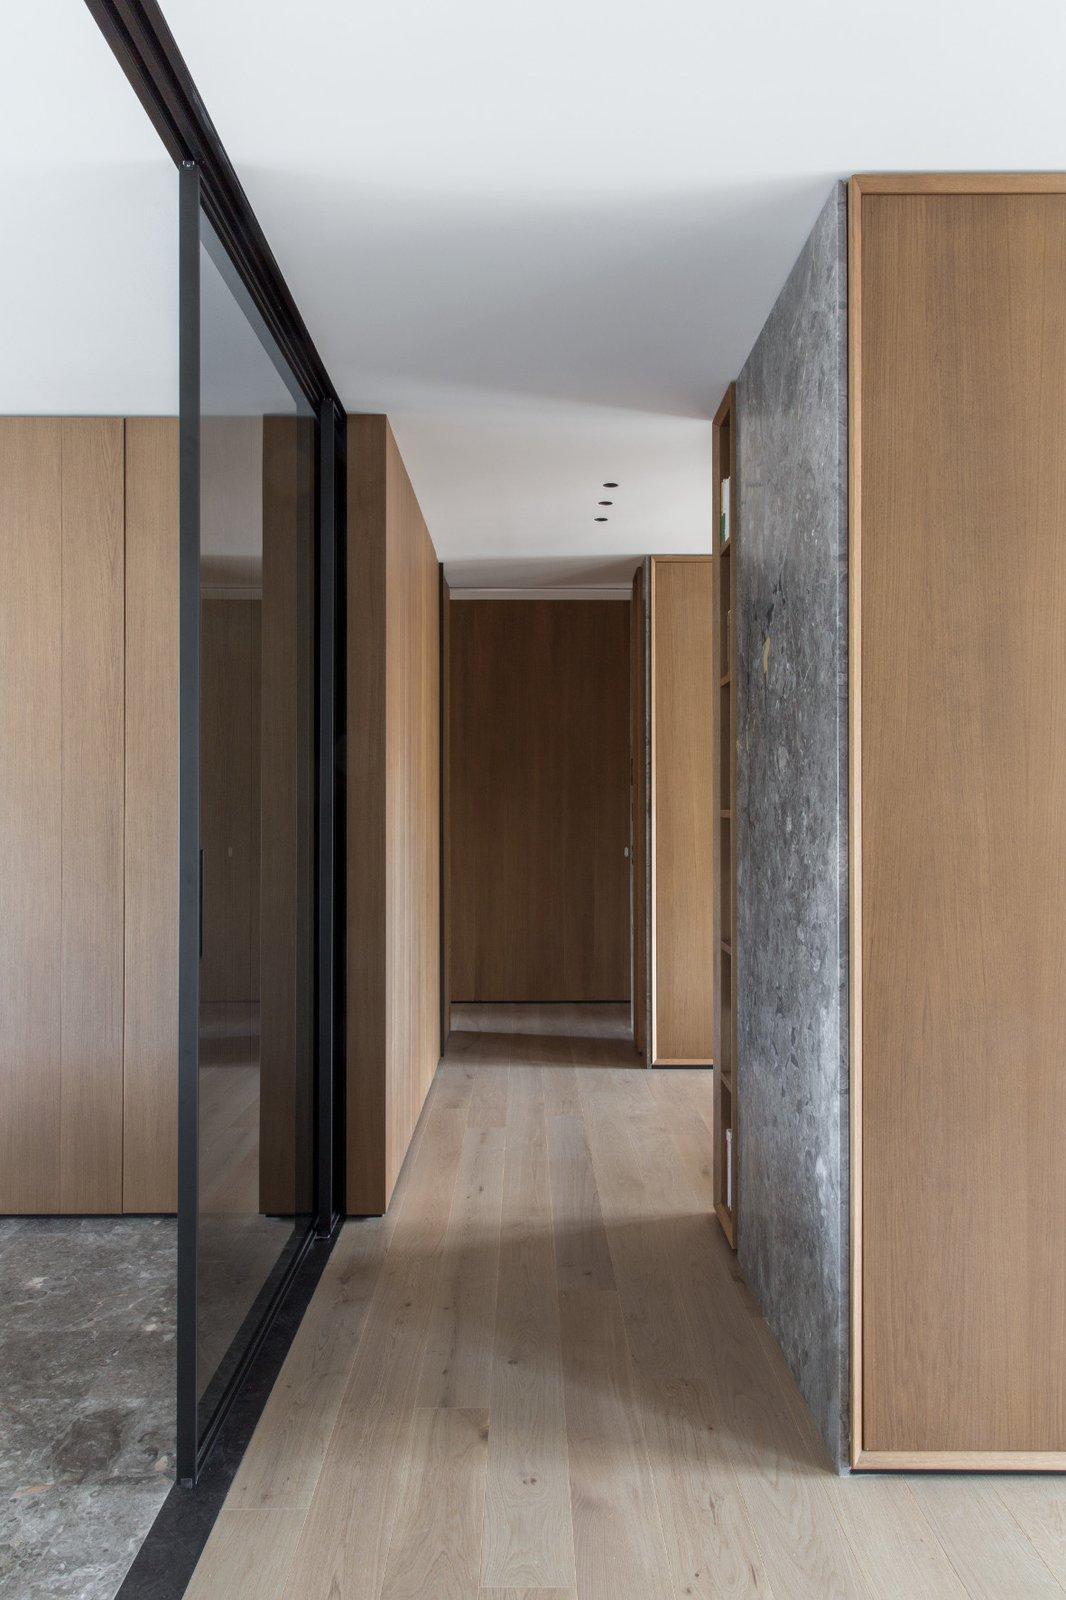 Hallway and Medium Hardwood Floor The smoked glass sliding door  House A326